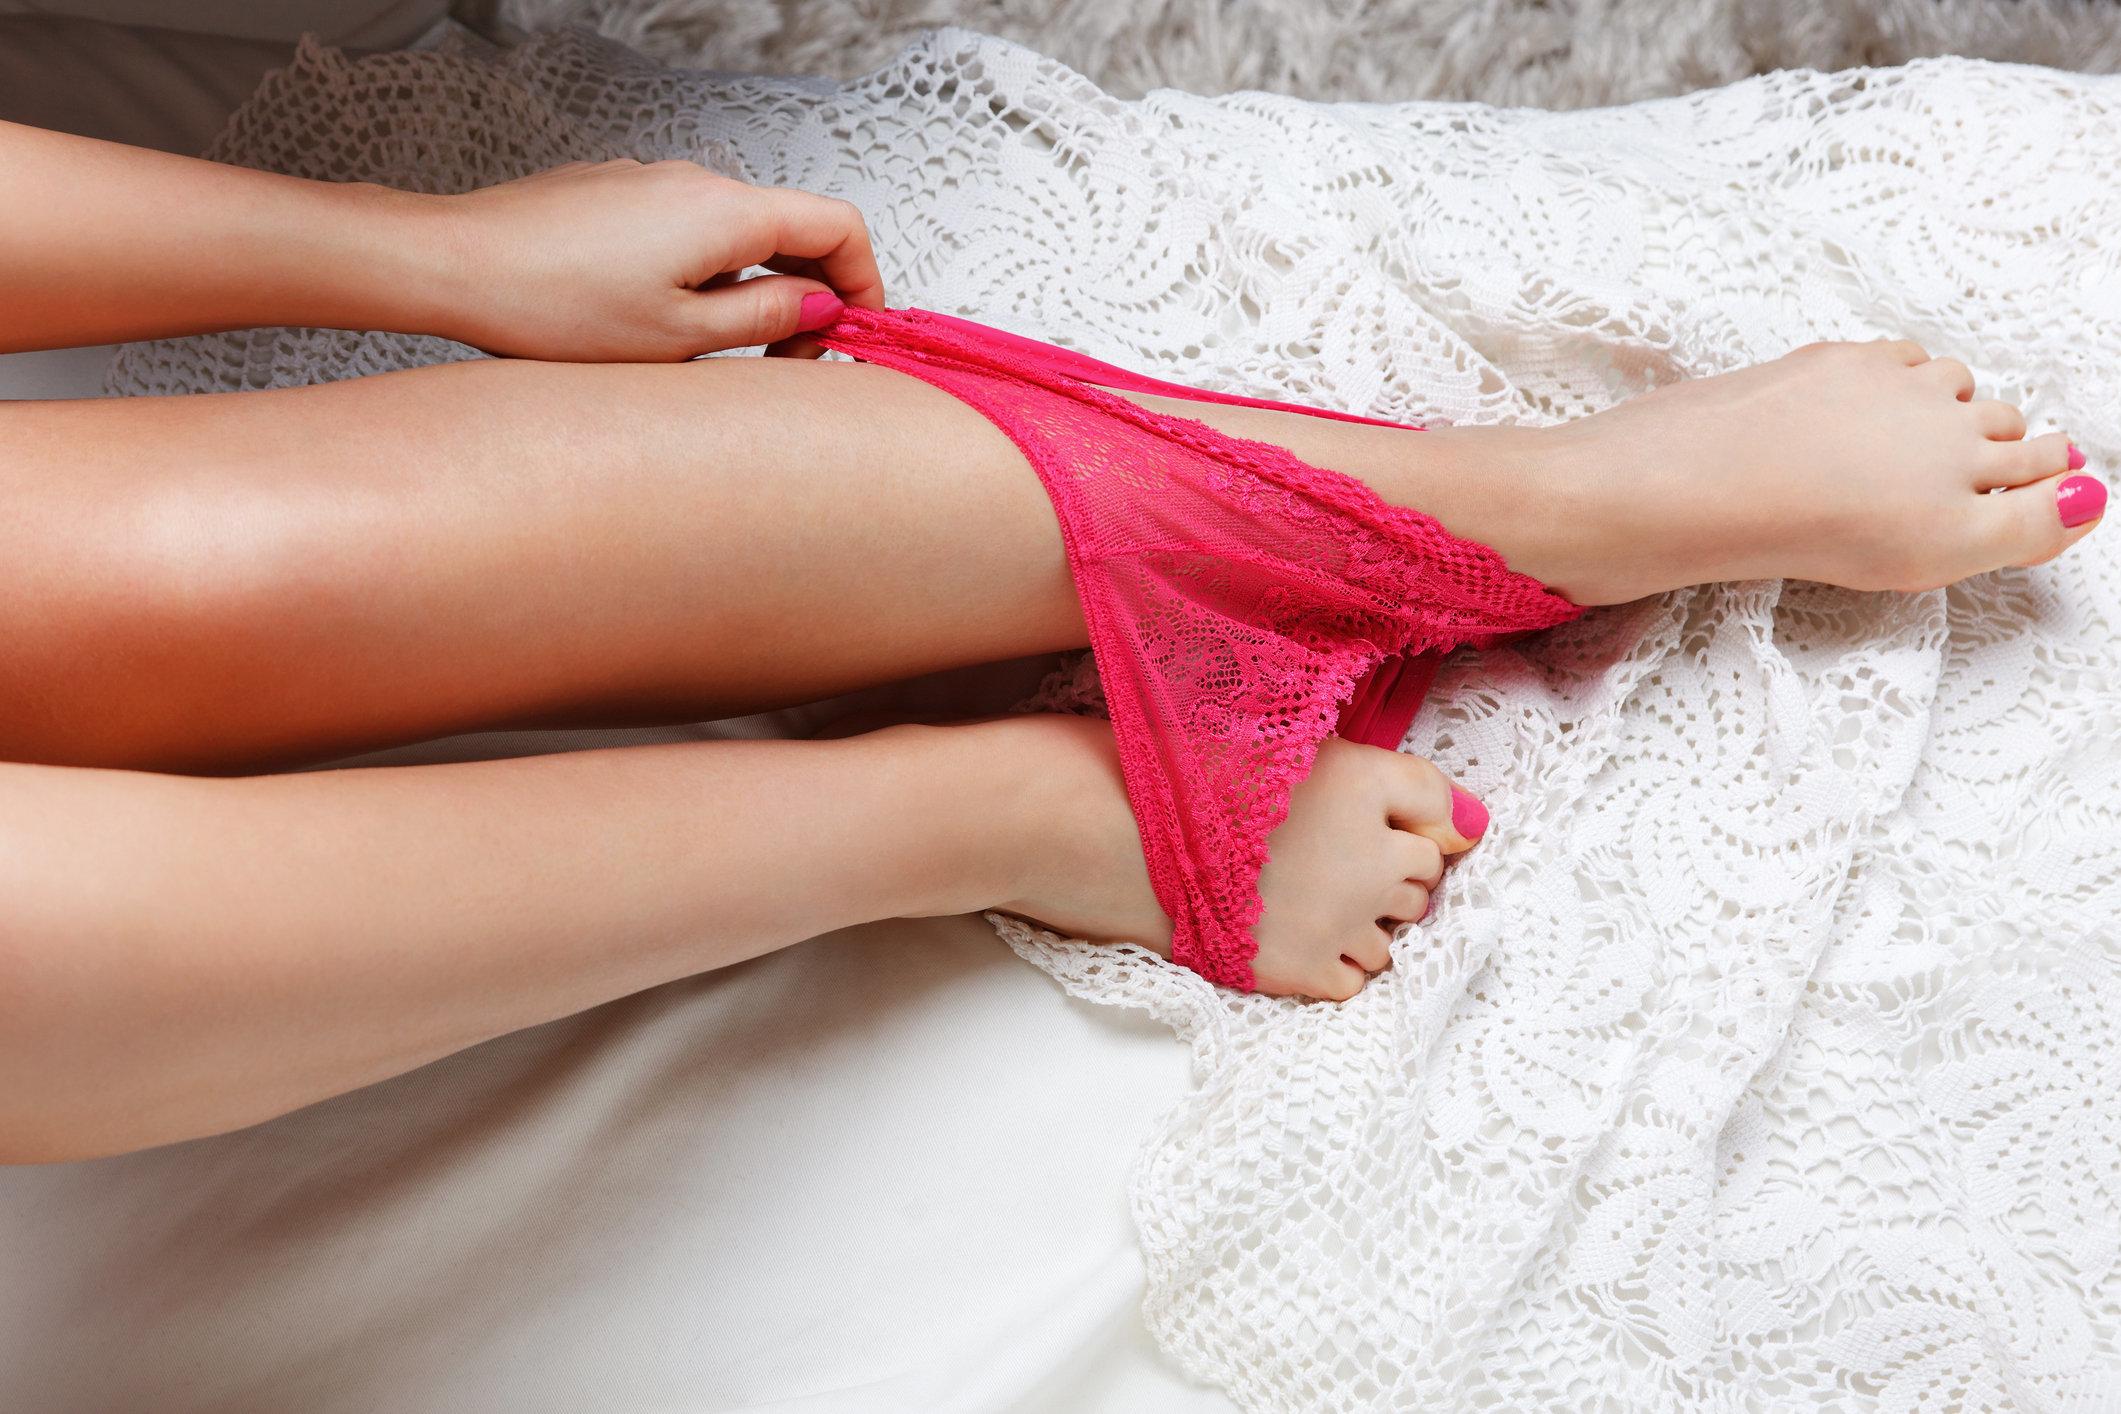 First time masturbation story